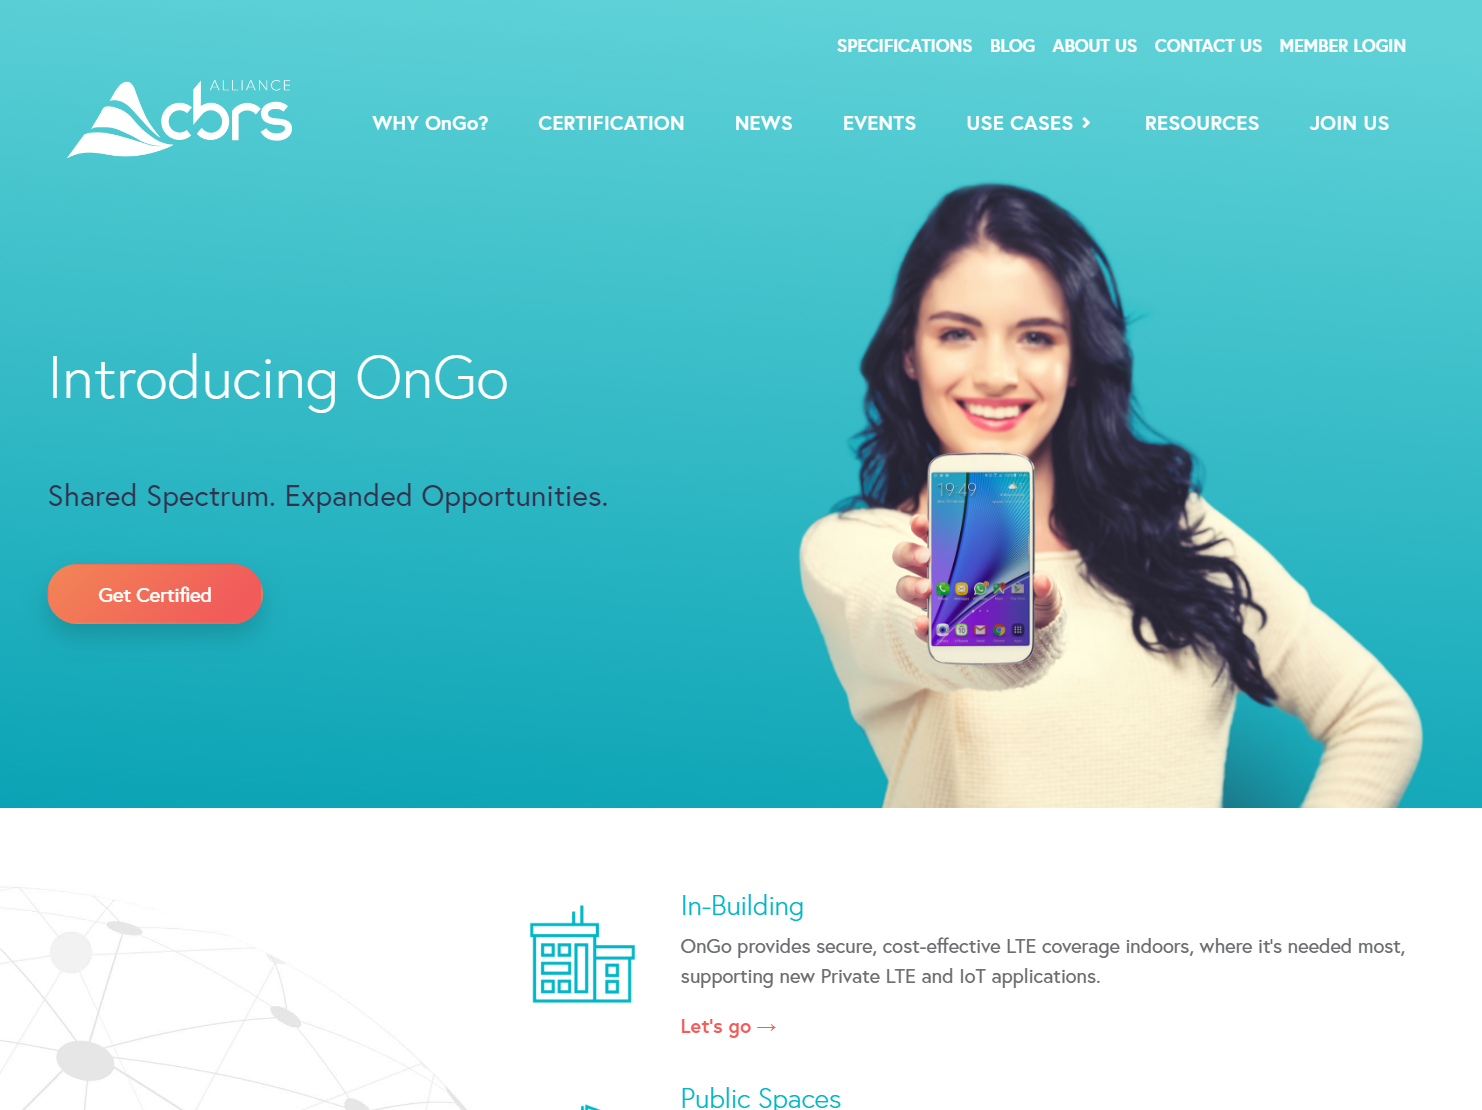 CBRS Allianceのウェブサイト